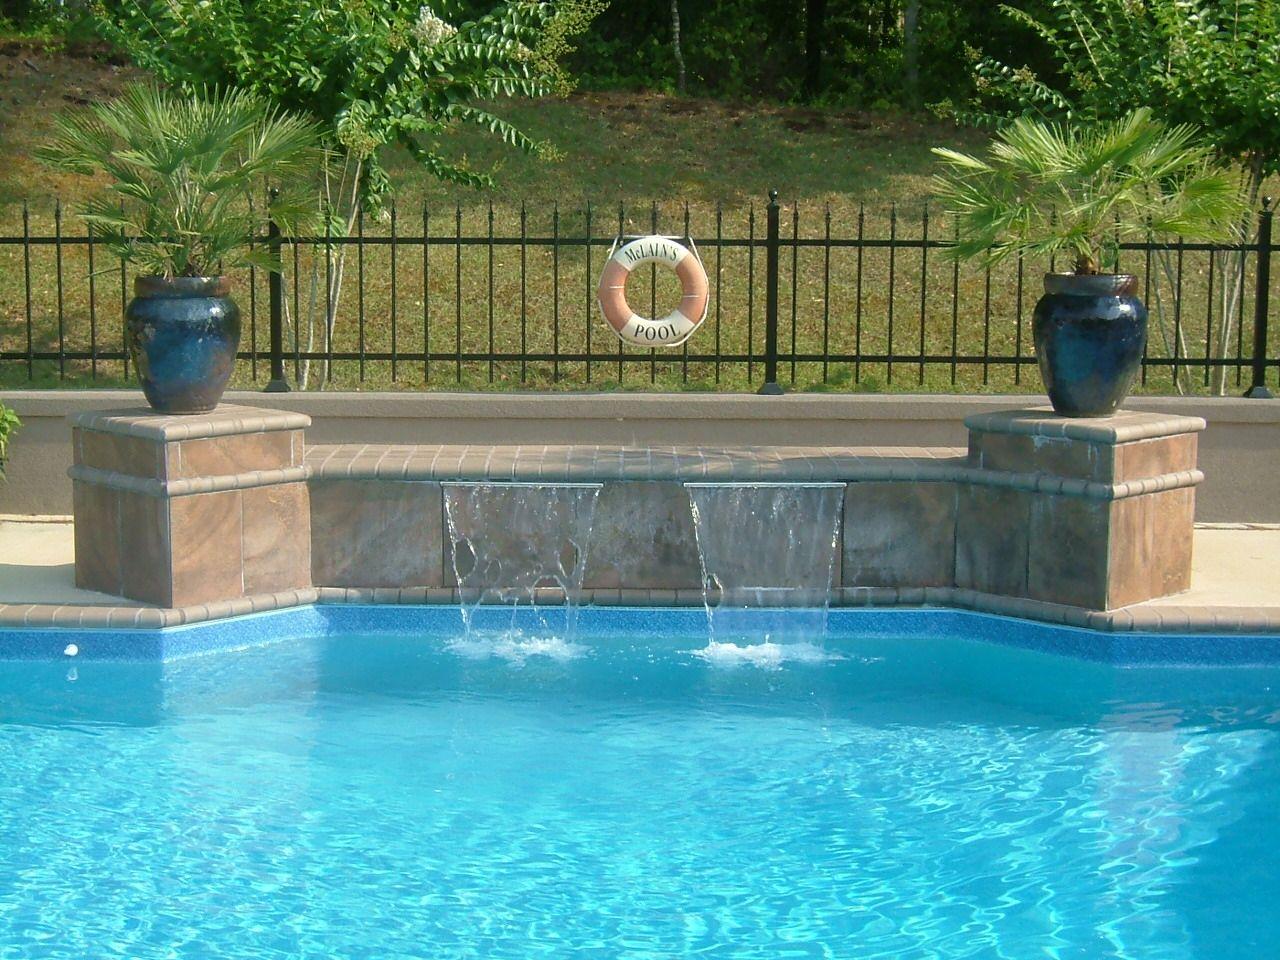 Waterfall On Pools Google Search Swimming Pool Waterfall Swimming Pools Backyard Inground Inground Pool Designs